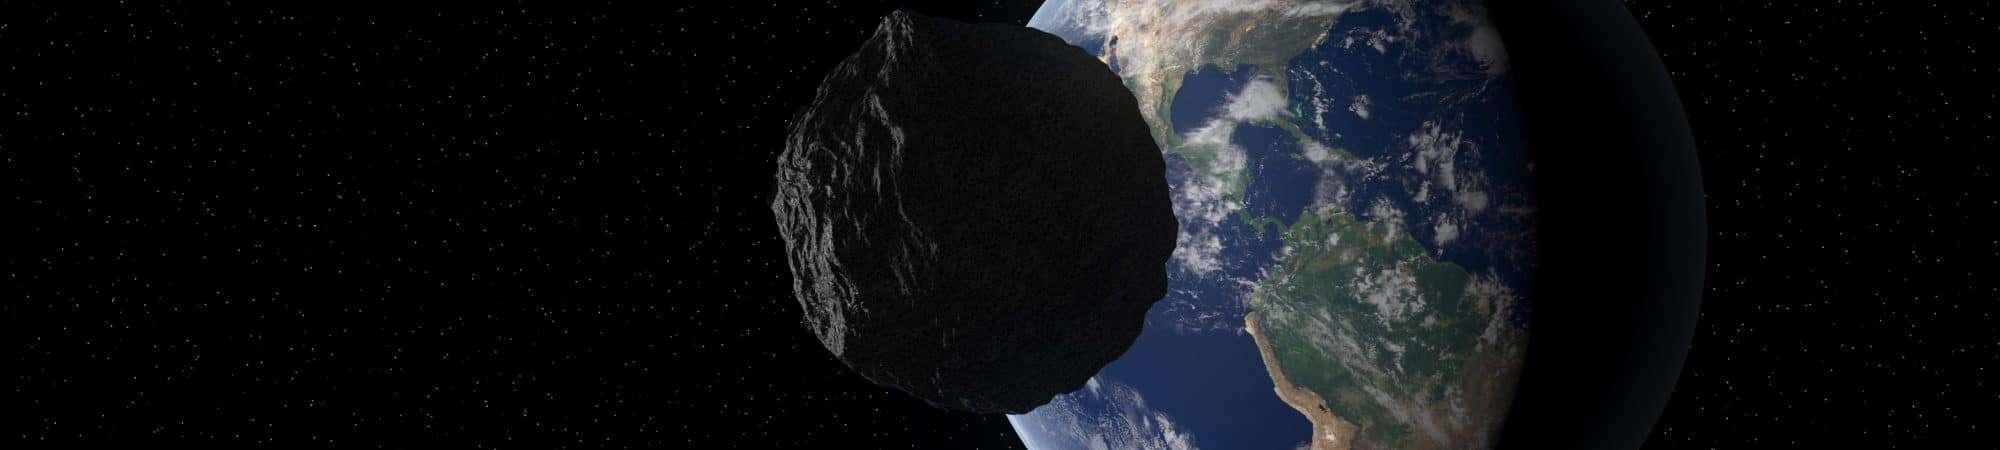 Asteroide Bennu tem sido investigado pela Osiris-REx